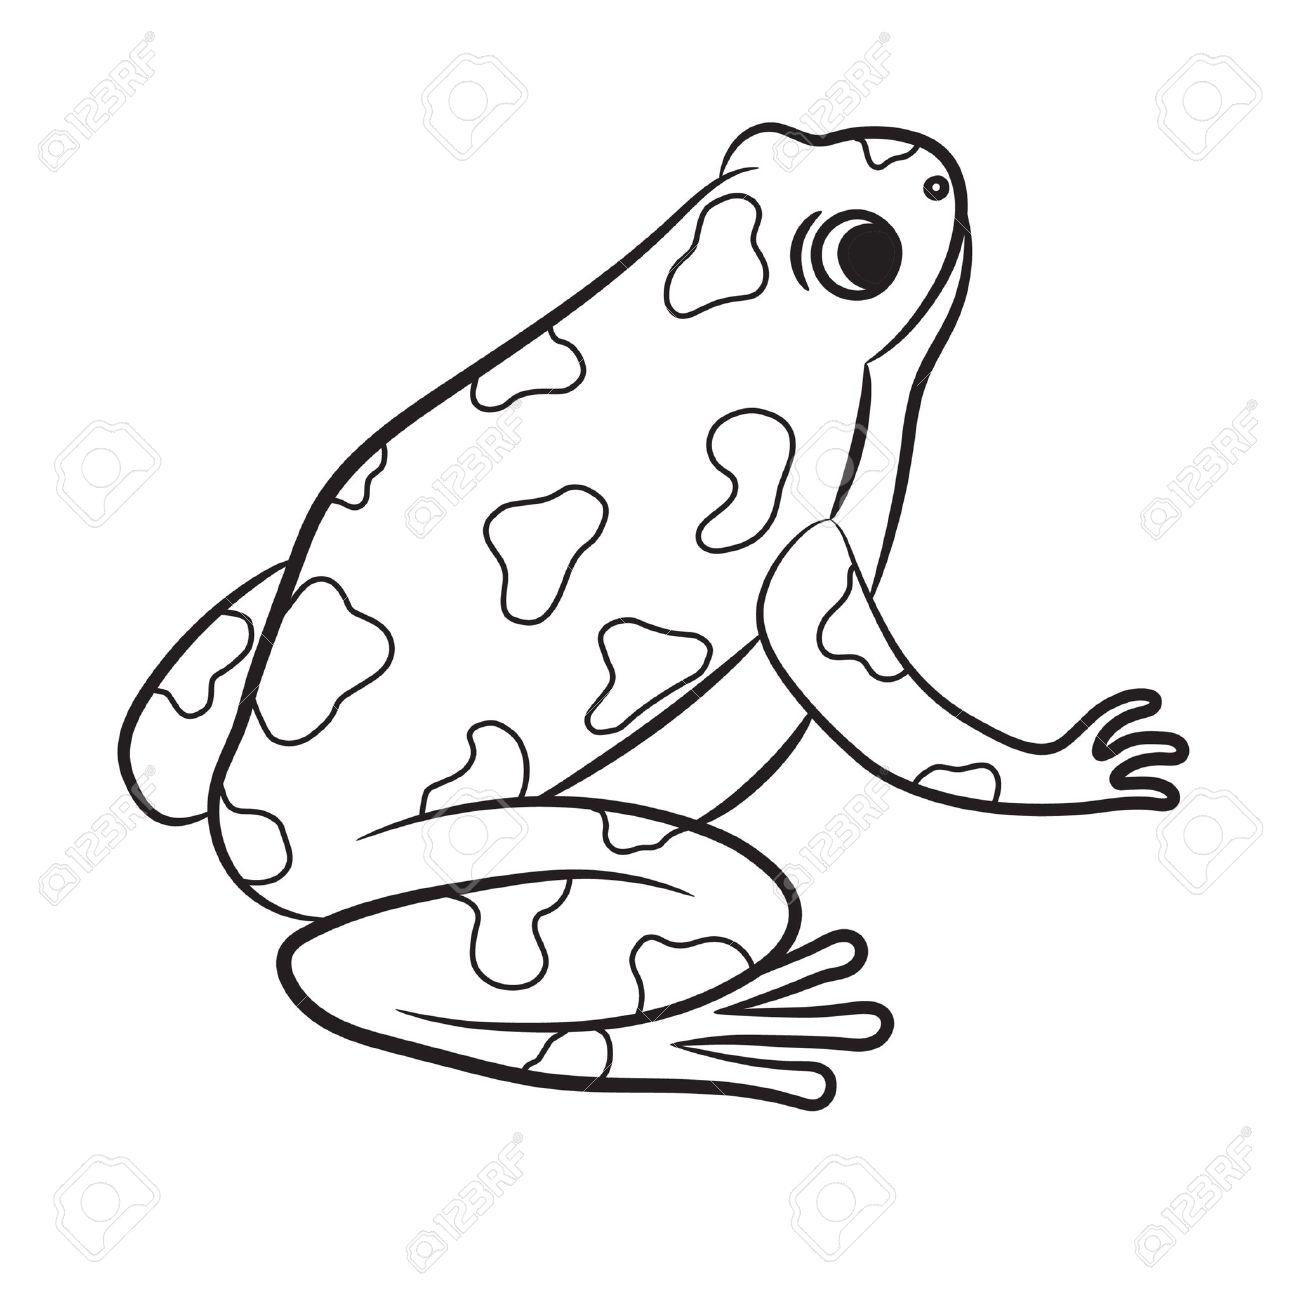 outlined poison dart frog vector royalty free cliparts vectors rh 123rf com Poison Dart Frog Drawing Golden Poison Dart Frog